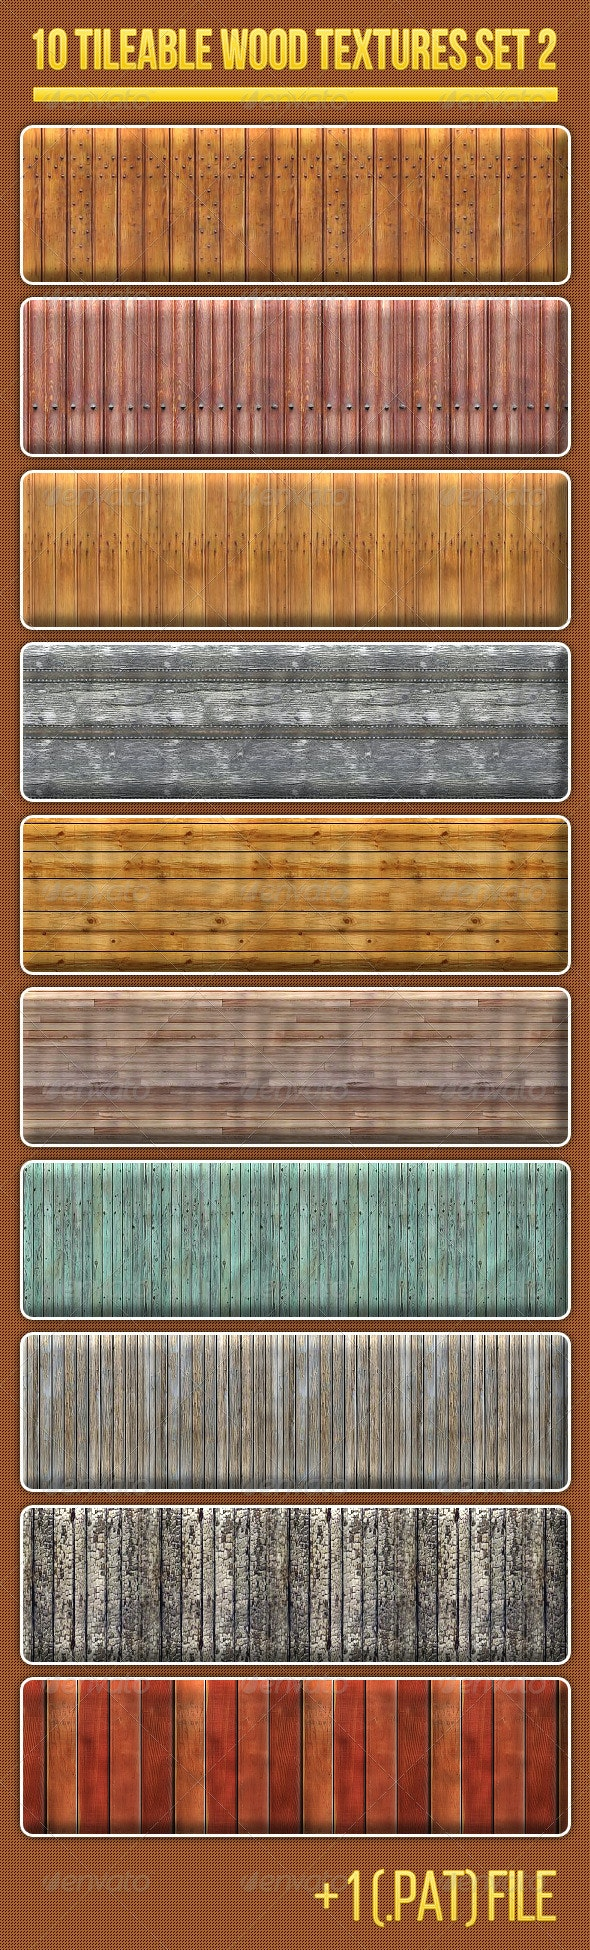 10 Tileable Wood Textures Set 2 - Wood Textures